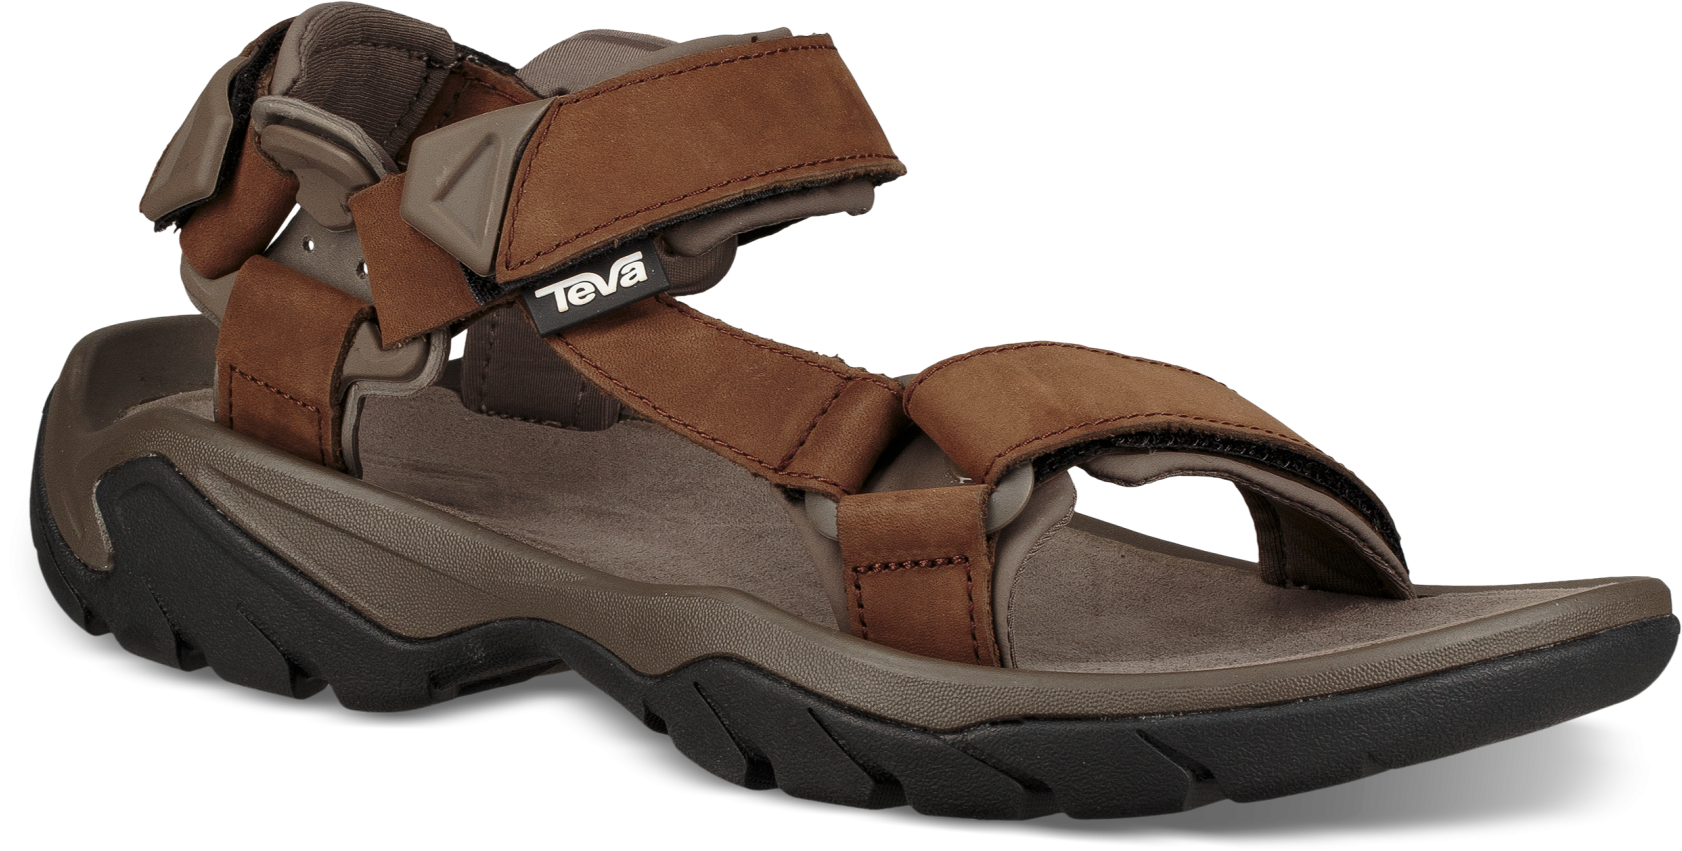 Teva Mens Terra Fi 5 Universal Leather Sandals